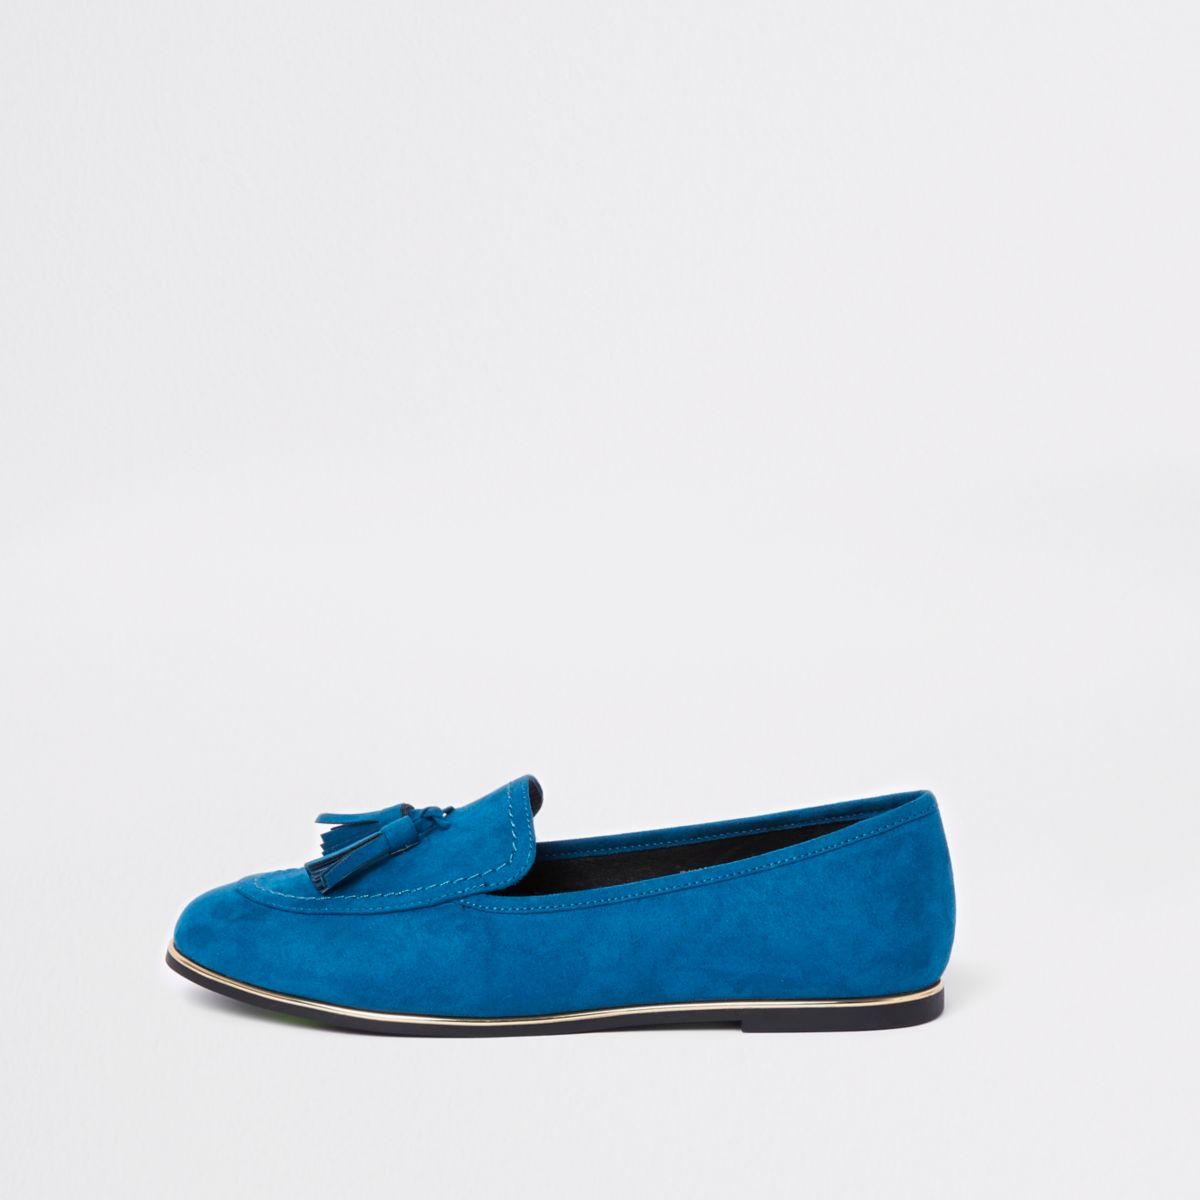 Blue gold tone trim tassel loafers